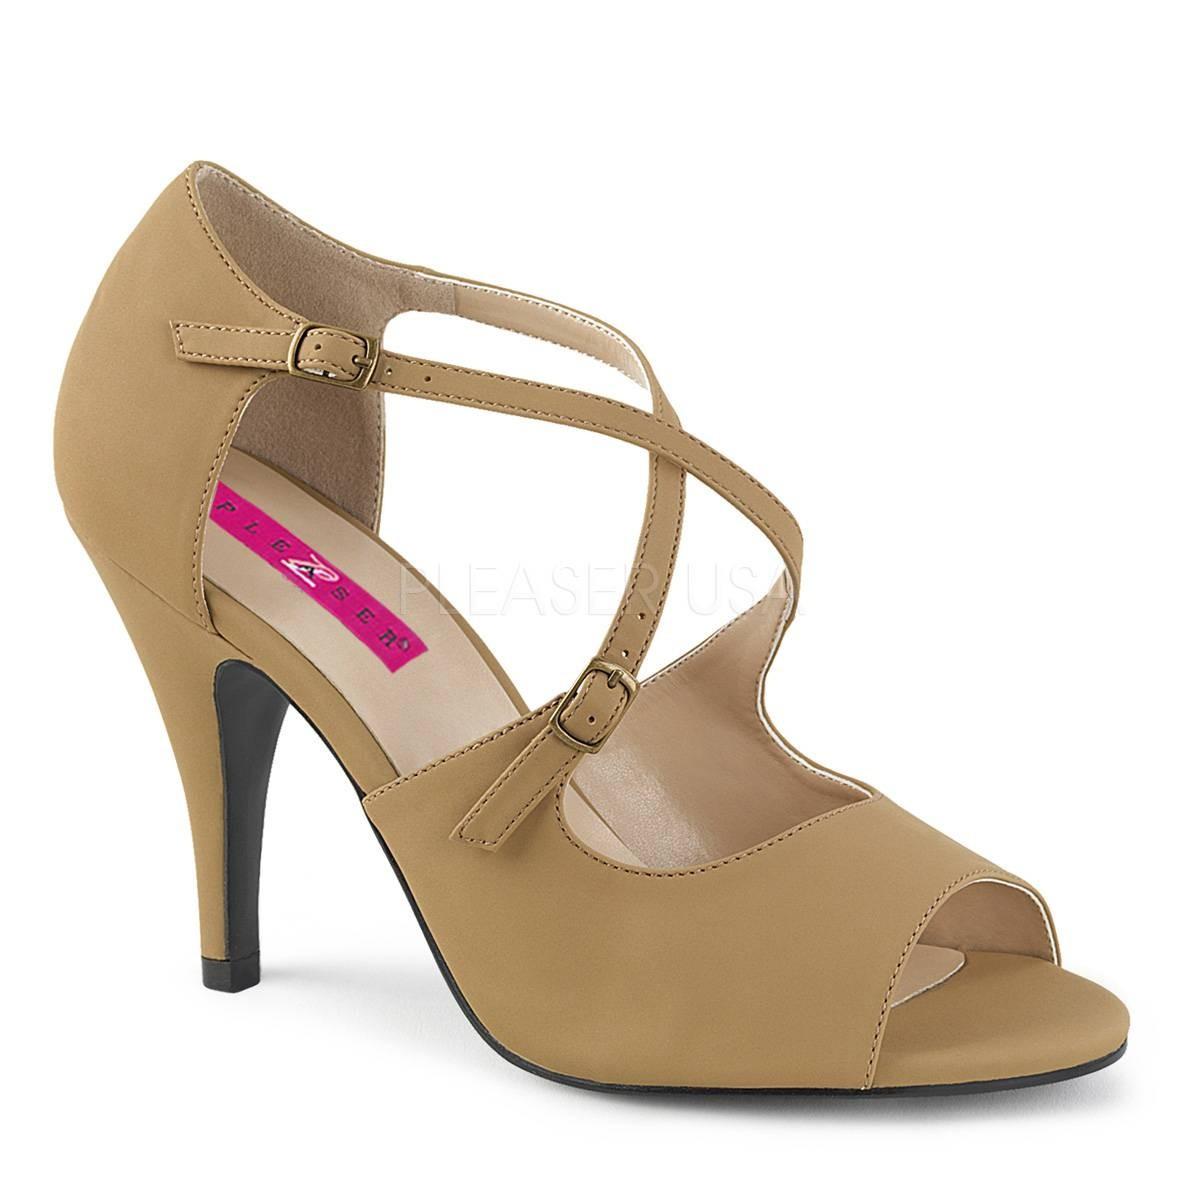 Sandalen - DREAM 412 ° Damen Peep Toe Sandalette ° BeigeMatt ° Pleaser Pink Label  - Onlineshop RedSixty